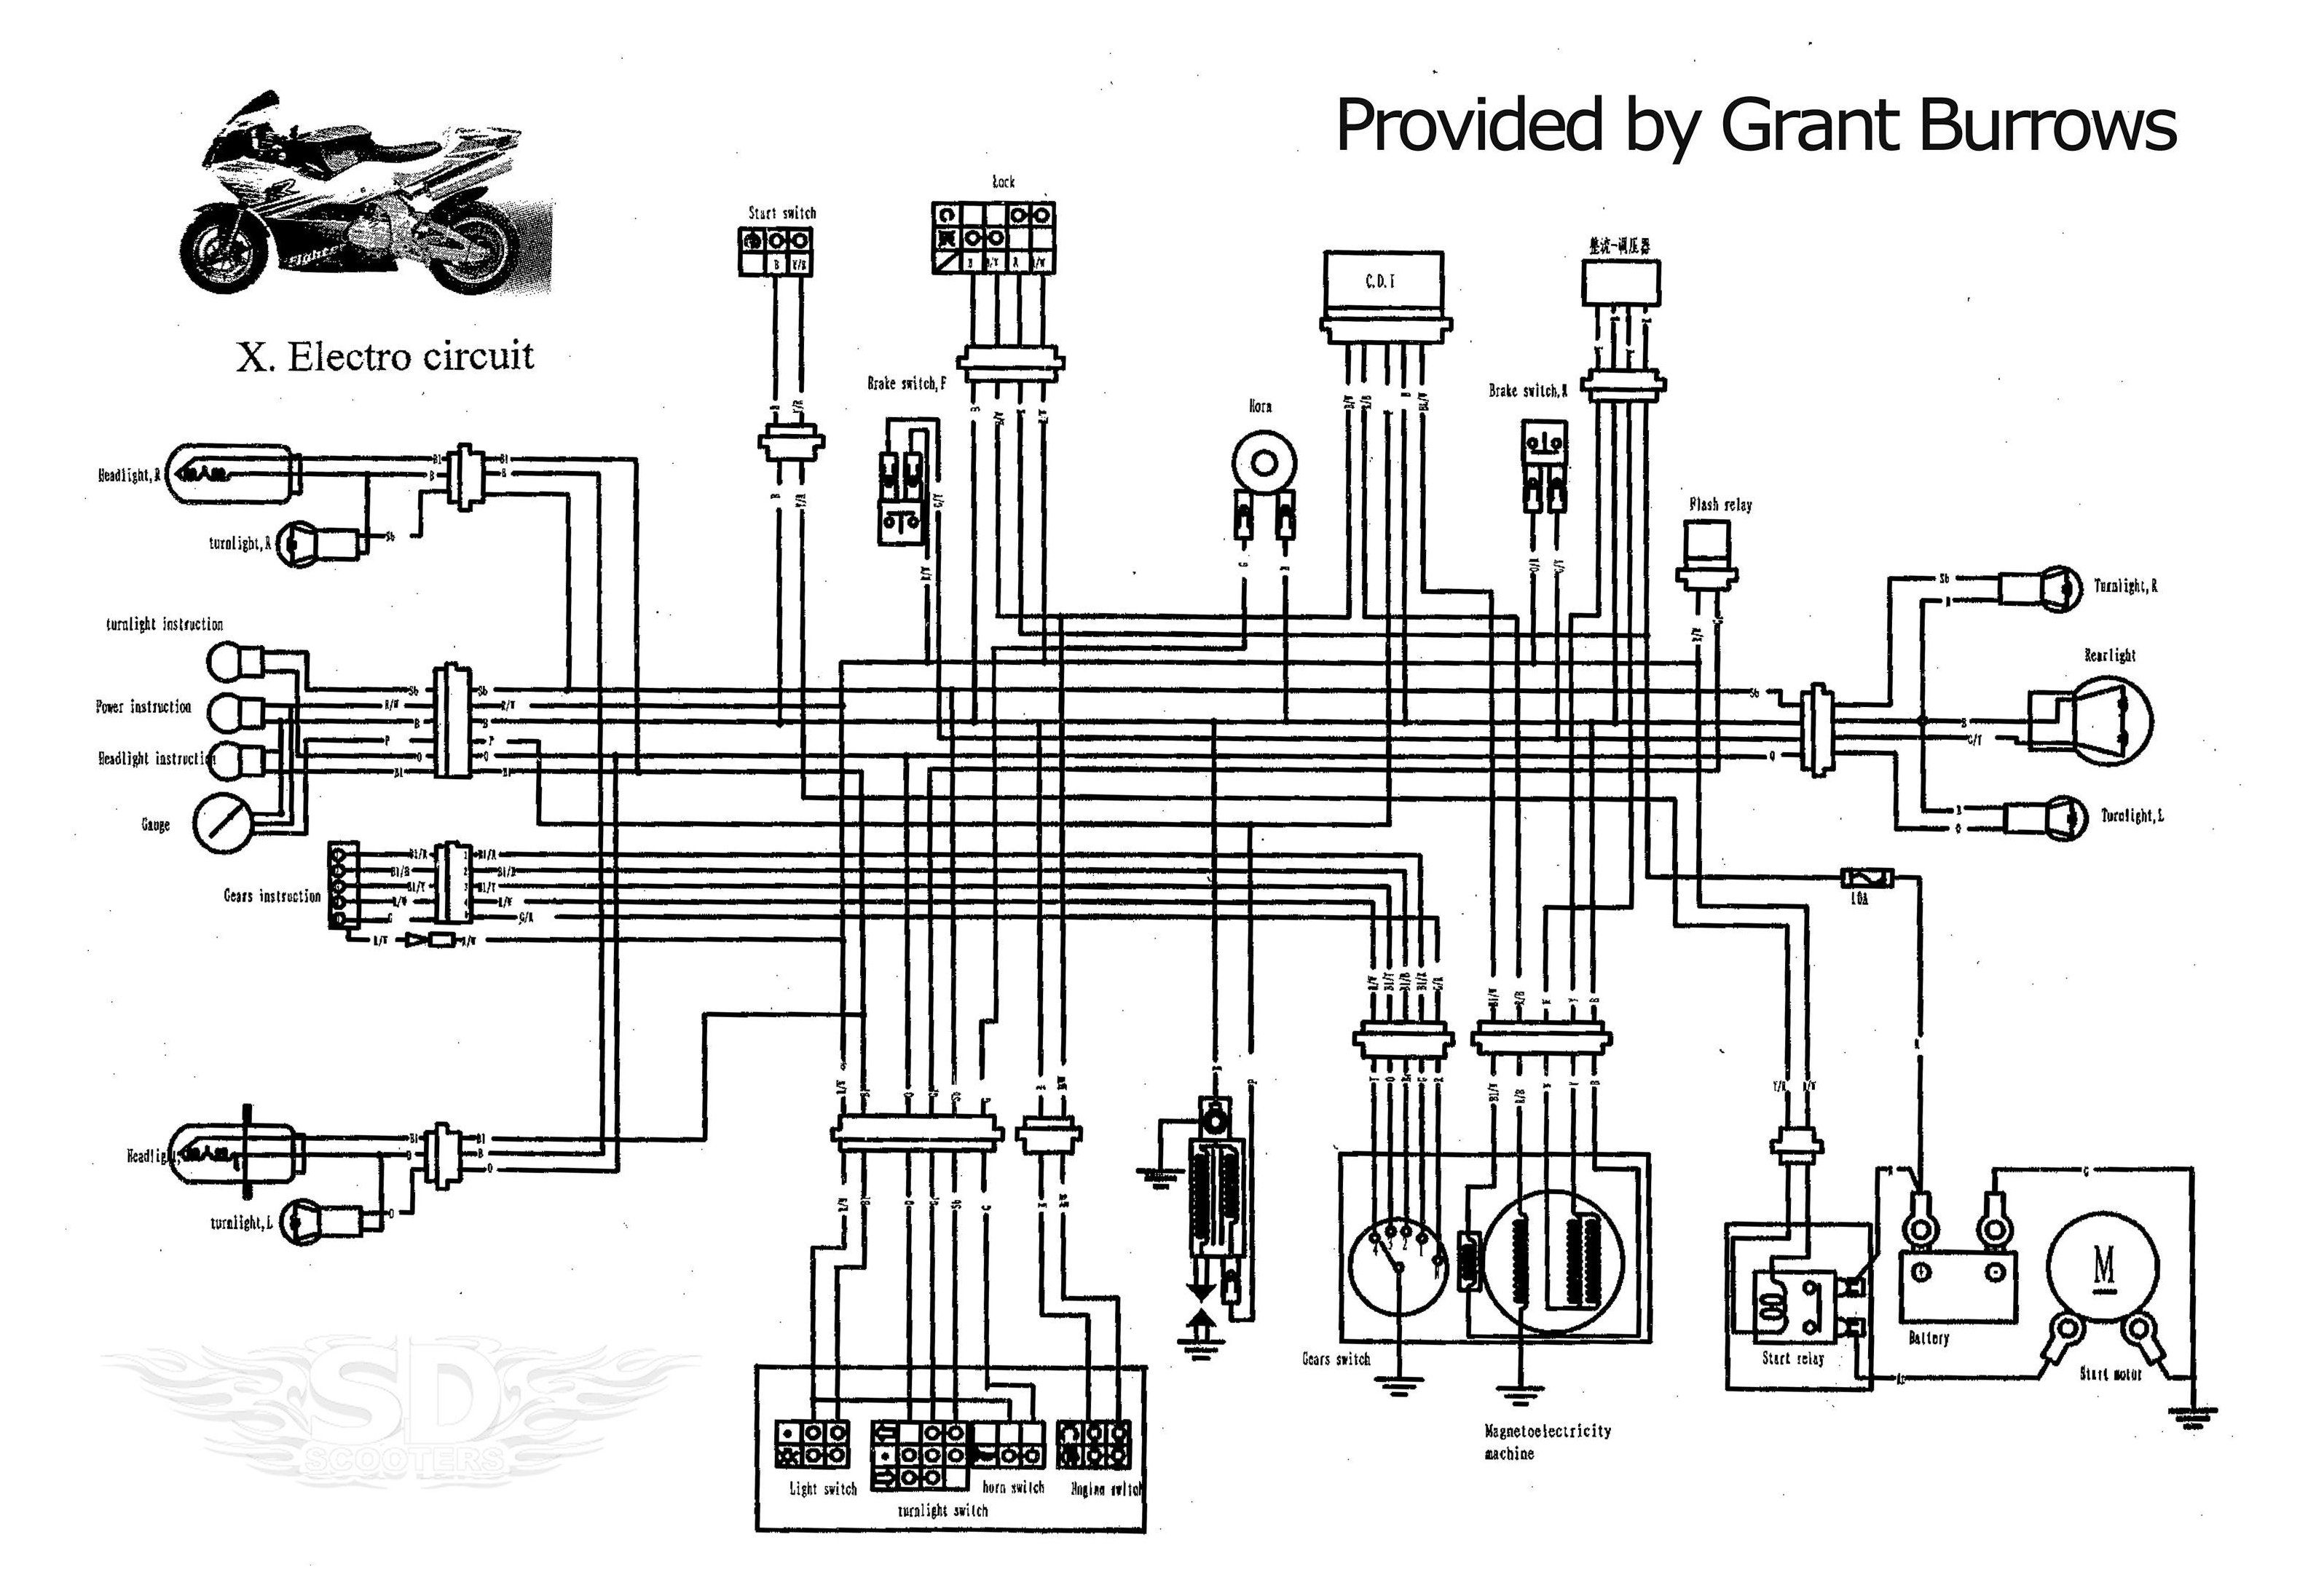 49cc Pocket Bike Engine Diagram #x1 #pocket #bike #x1pocketbike | Pocket  bike, Bike engine, Diagram | X1 Pocket Bike Wiring Harness |  | Pinterest